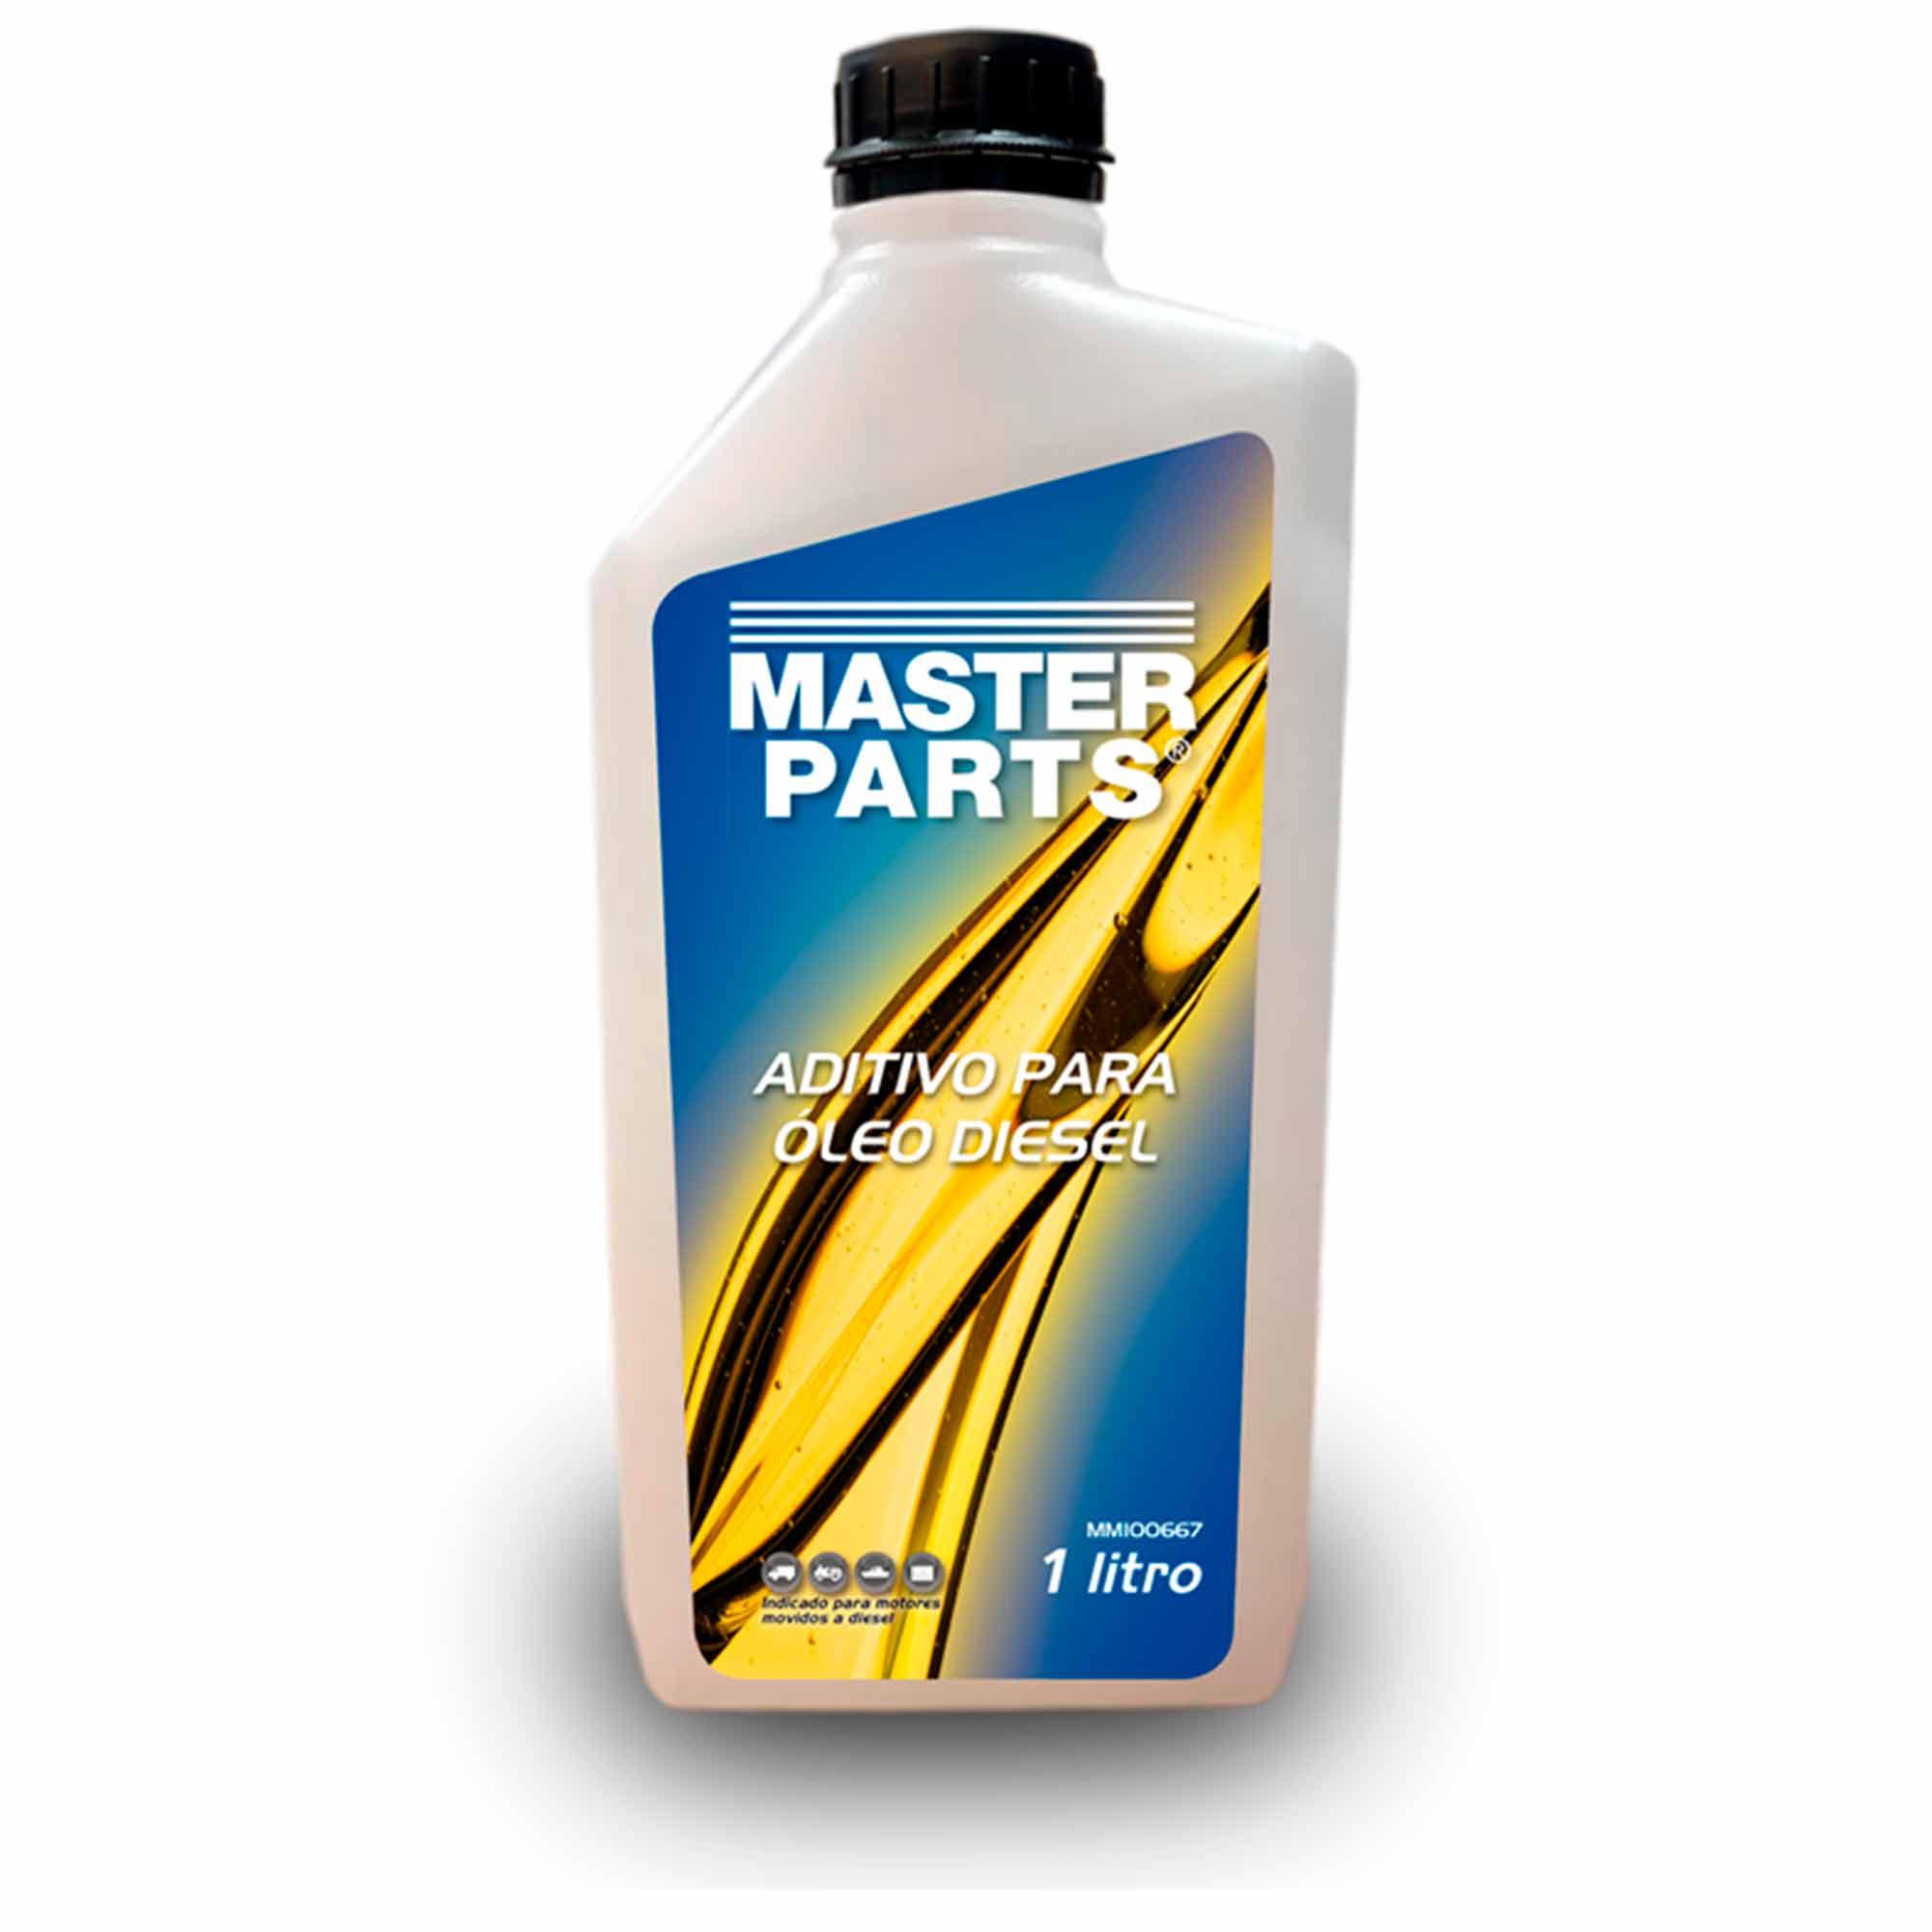 MM100667 - Aditivo para óleo diesel 1L